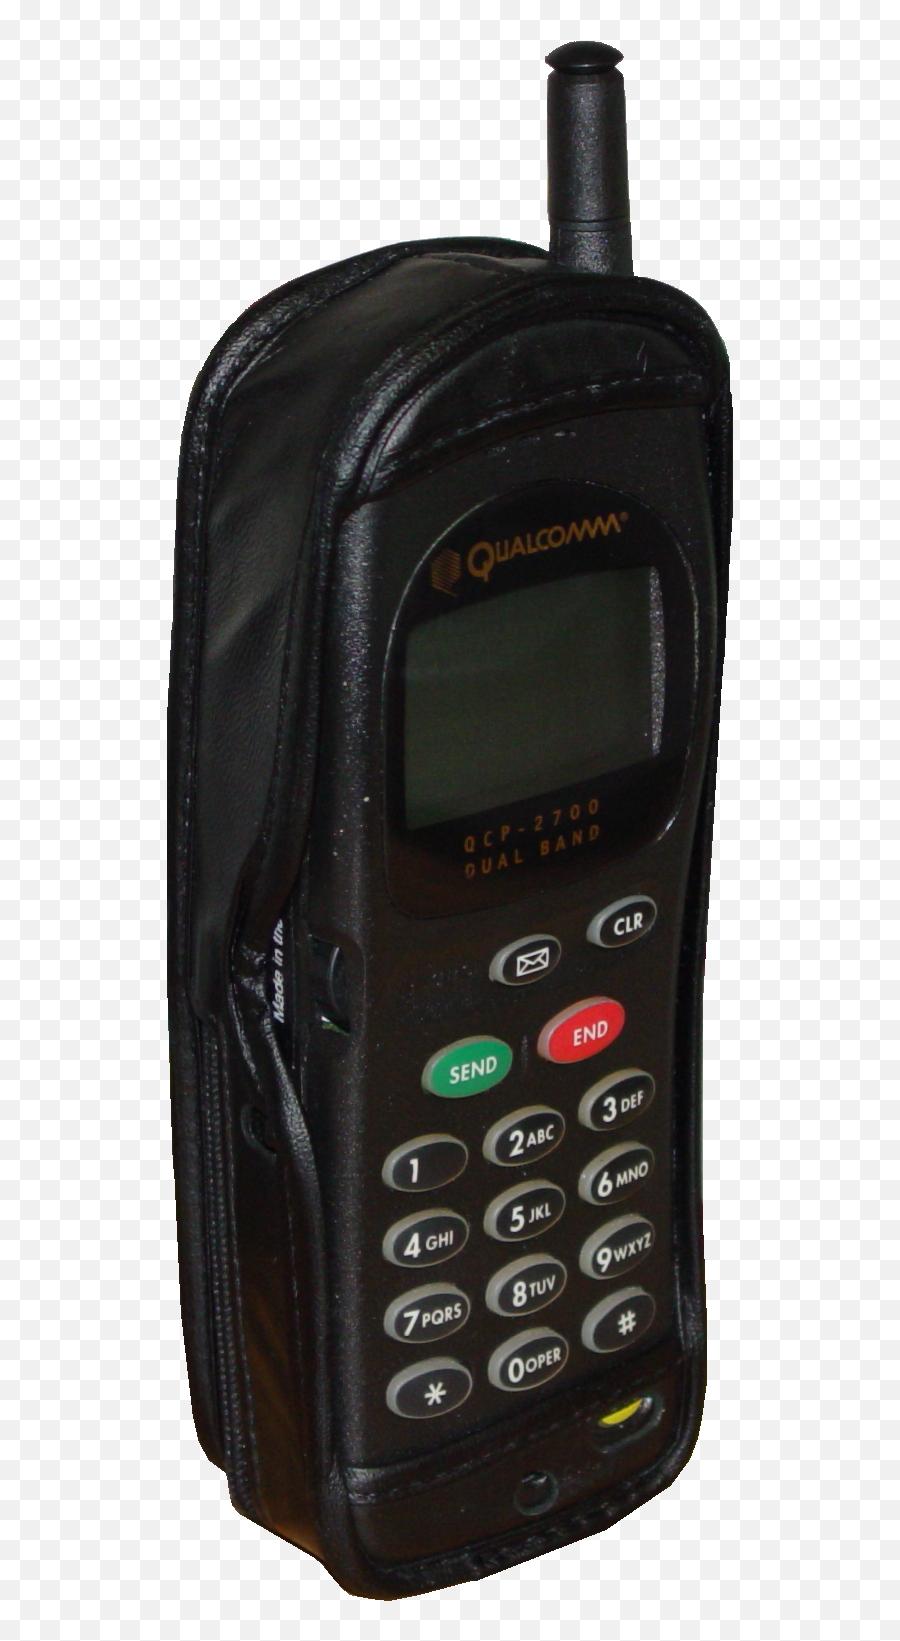 Qualcomm - Qualcomm First Cell Phone Emoji,Samsung Emoji To Iphone Translator